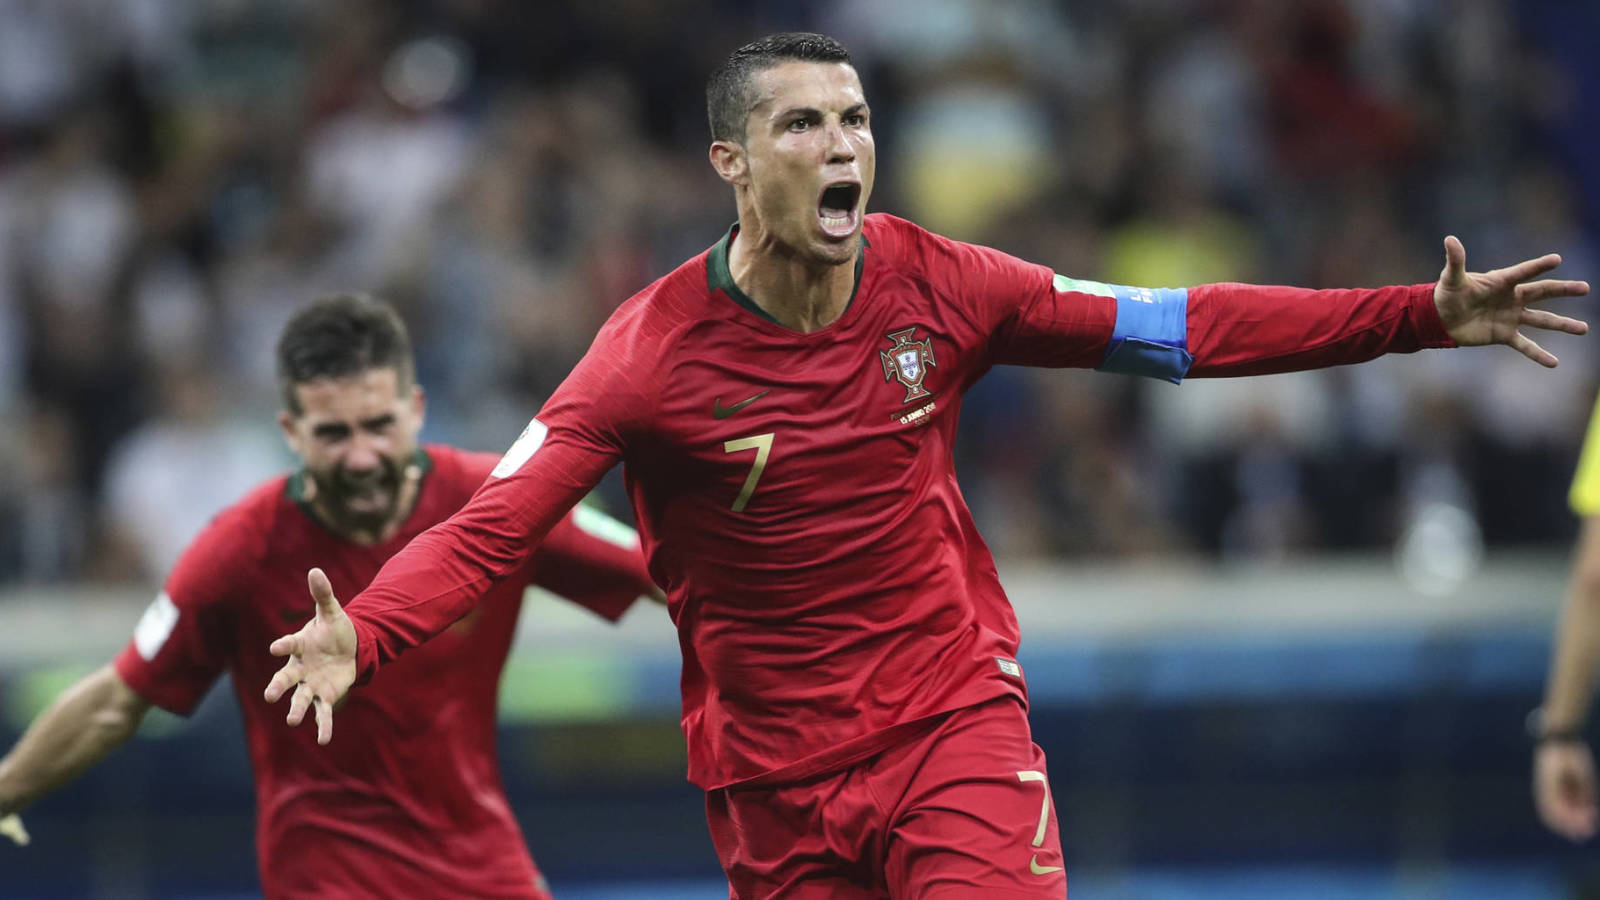 Cristiano Ronaldo becomes first $1 billion soccer player